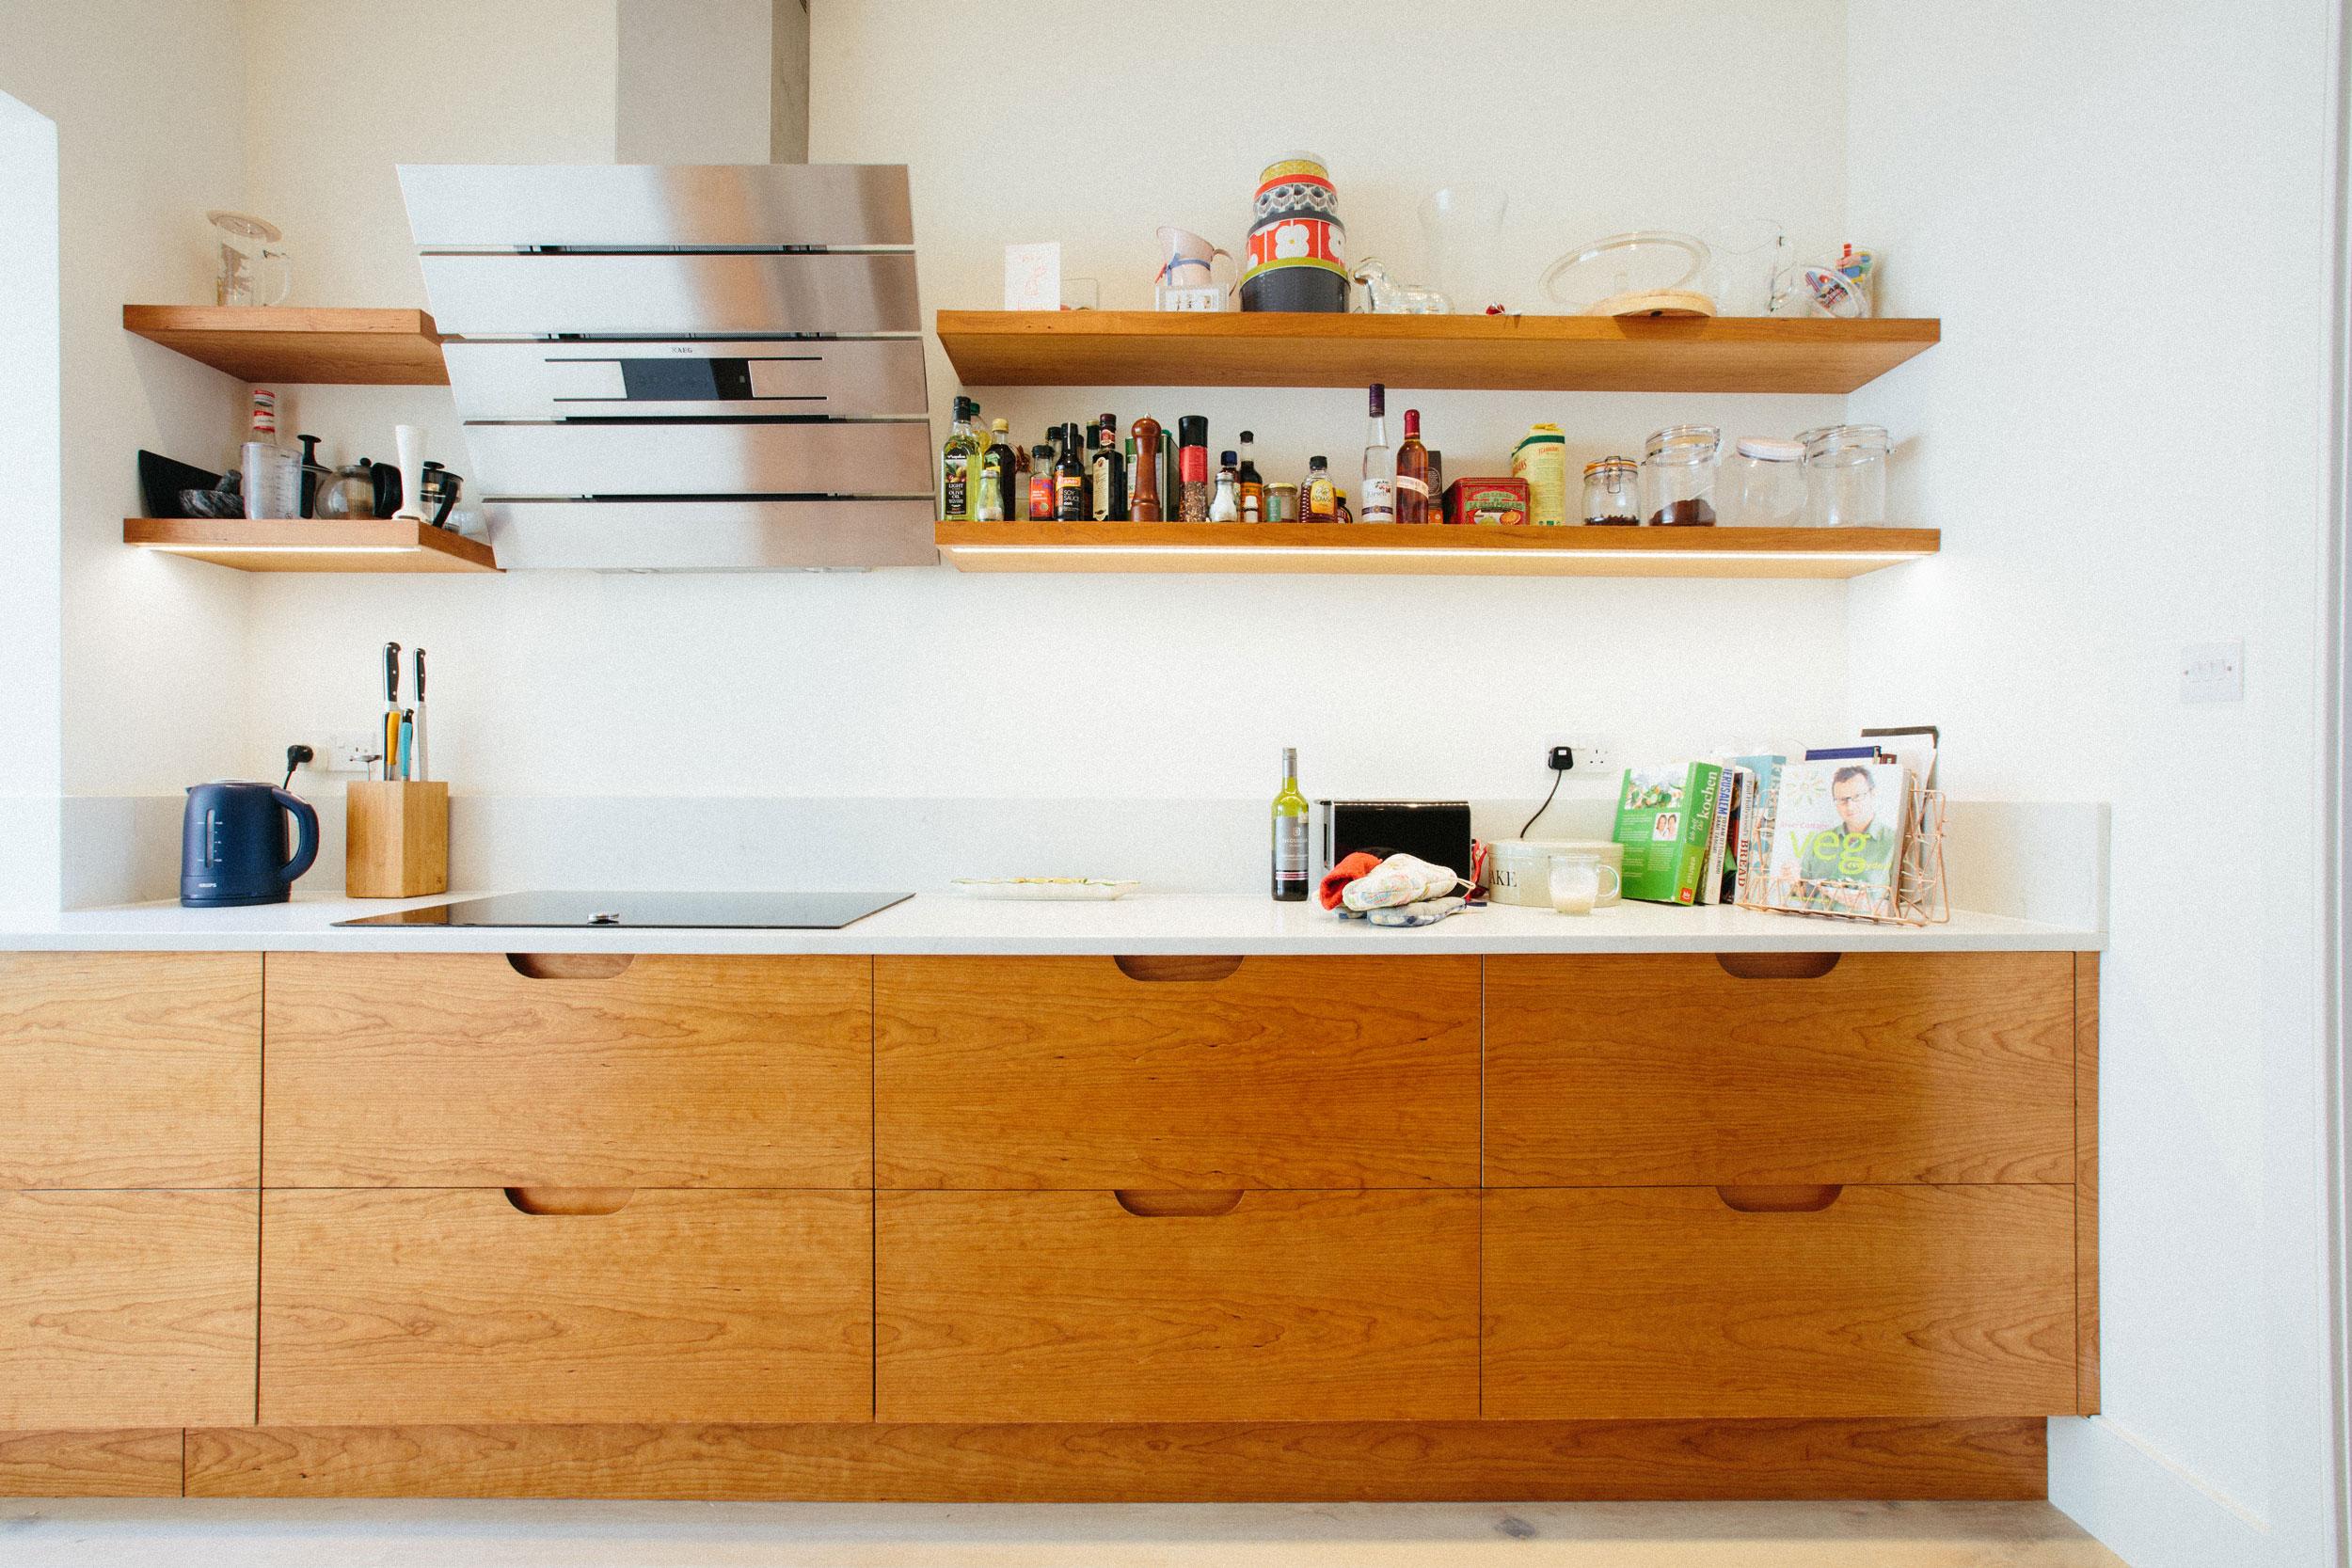 East Dulwich Kitchens - West & Reid